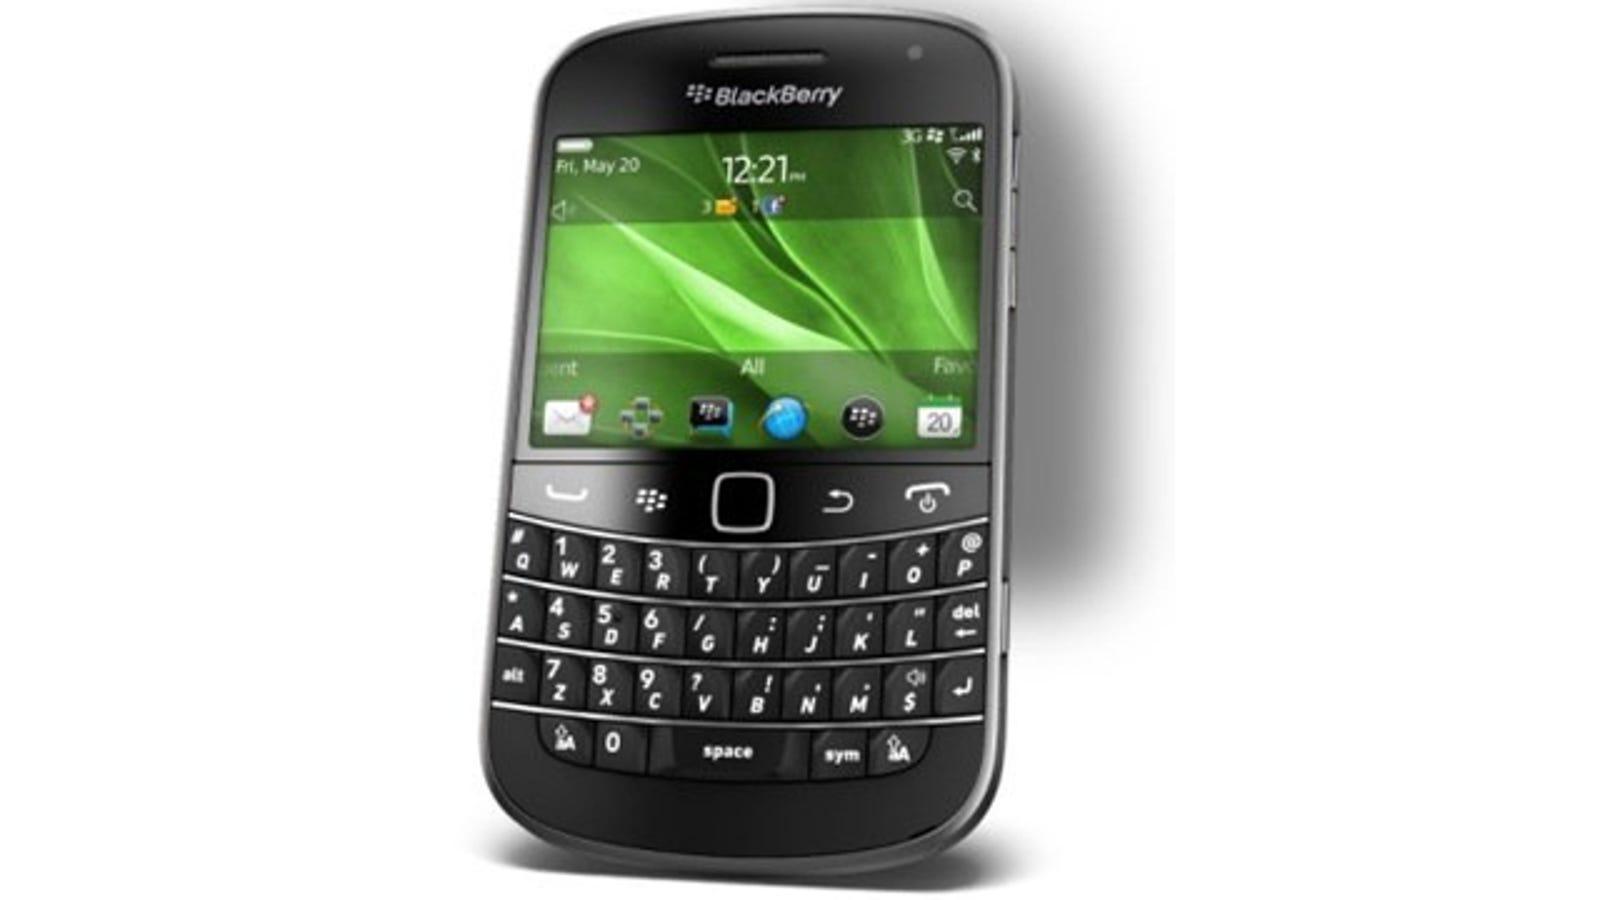 blackberry bold user manual pdf